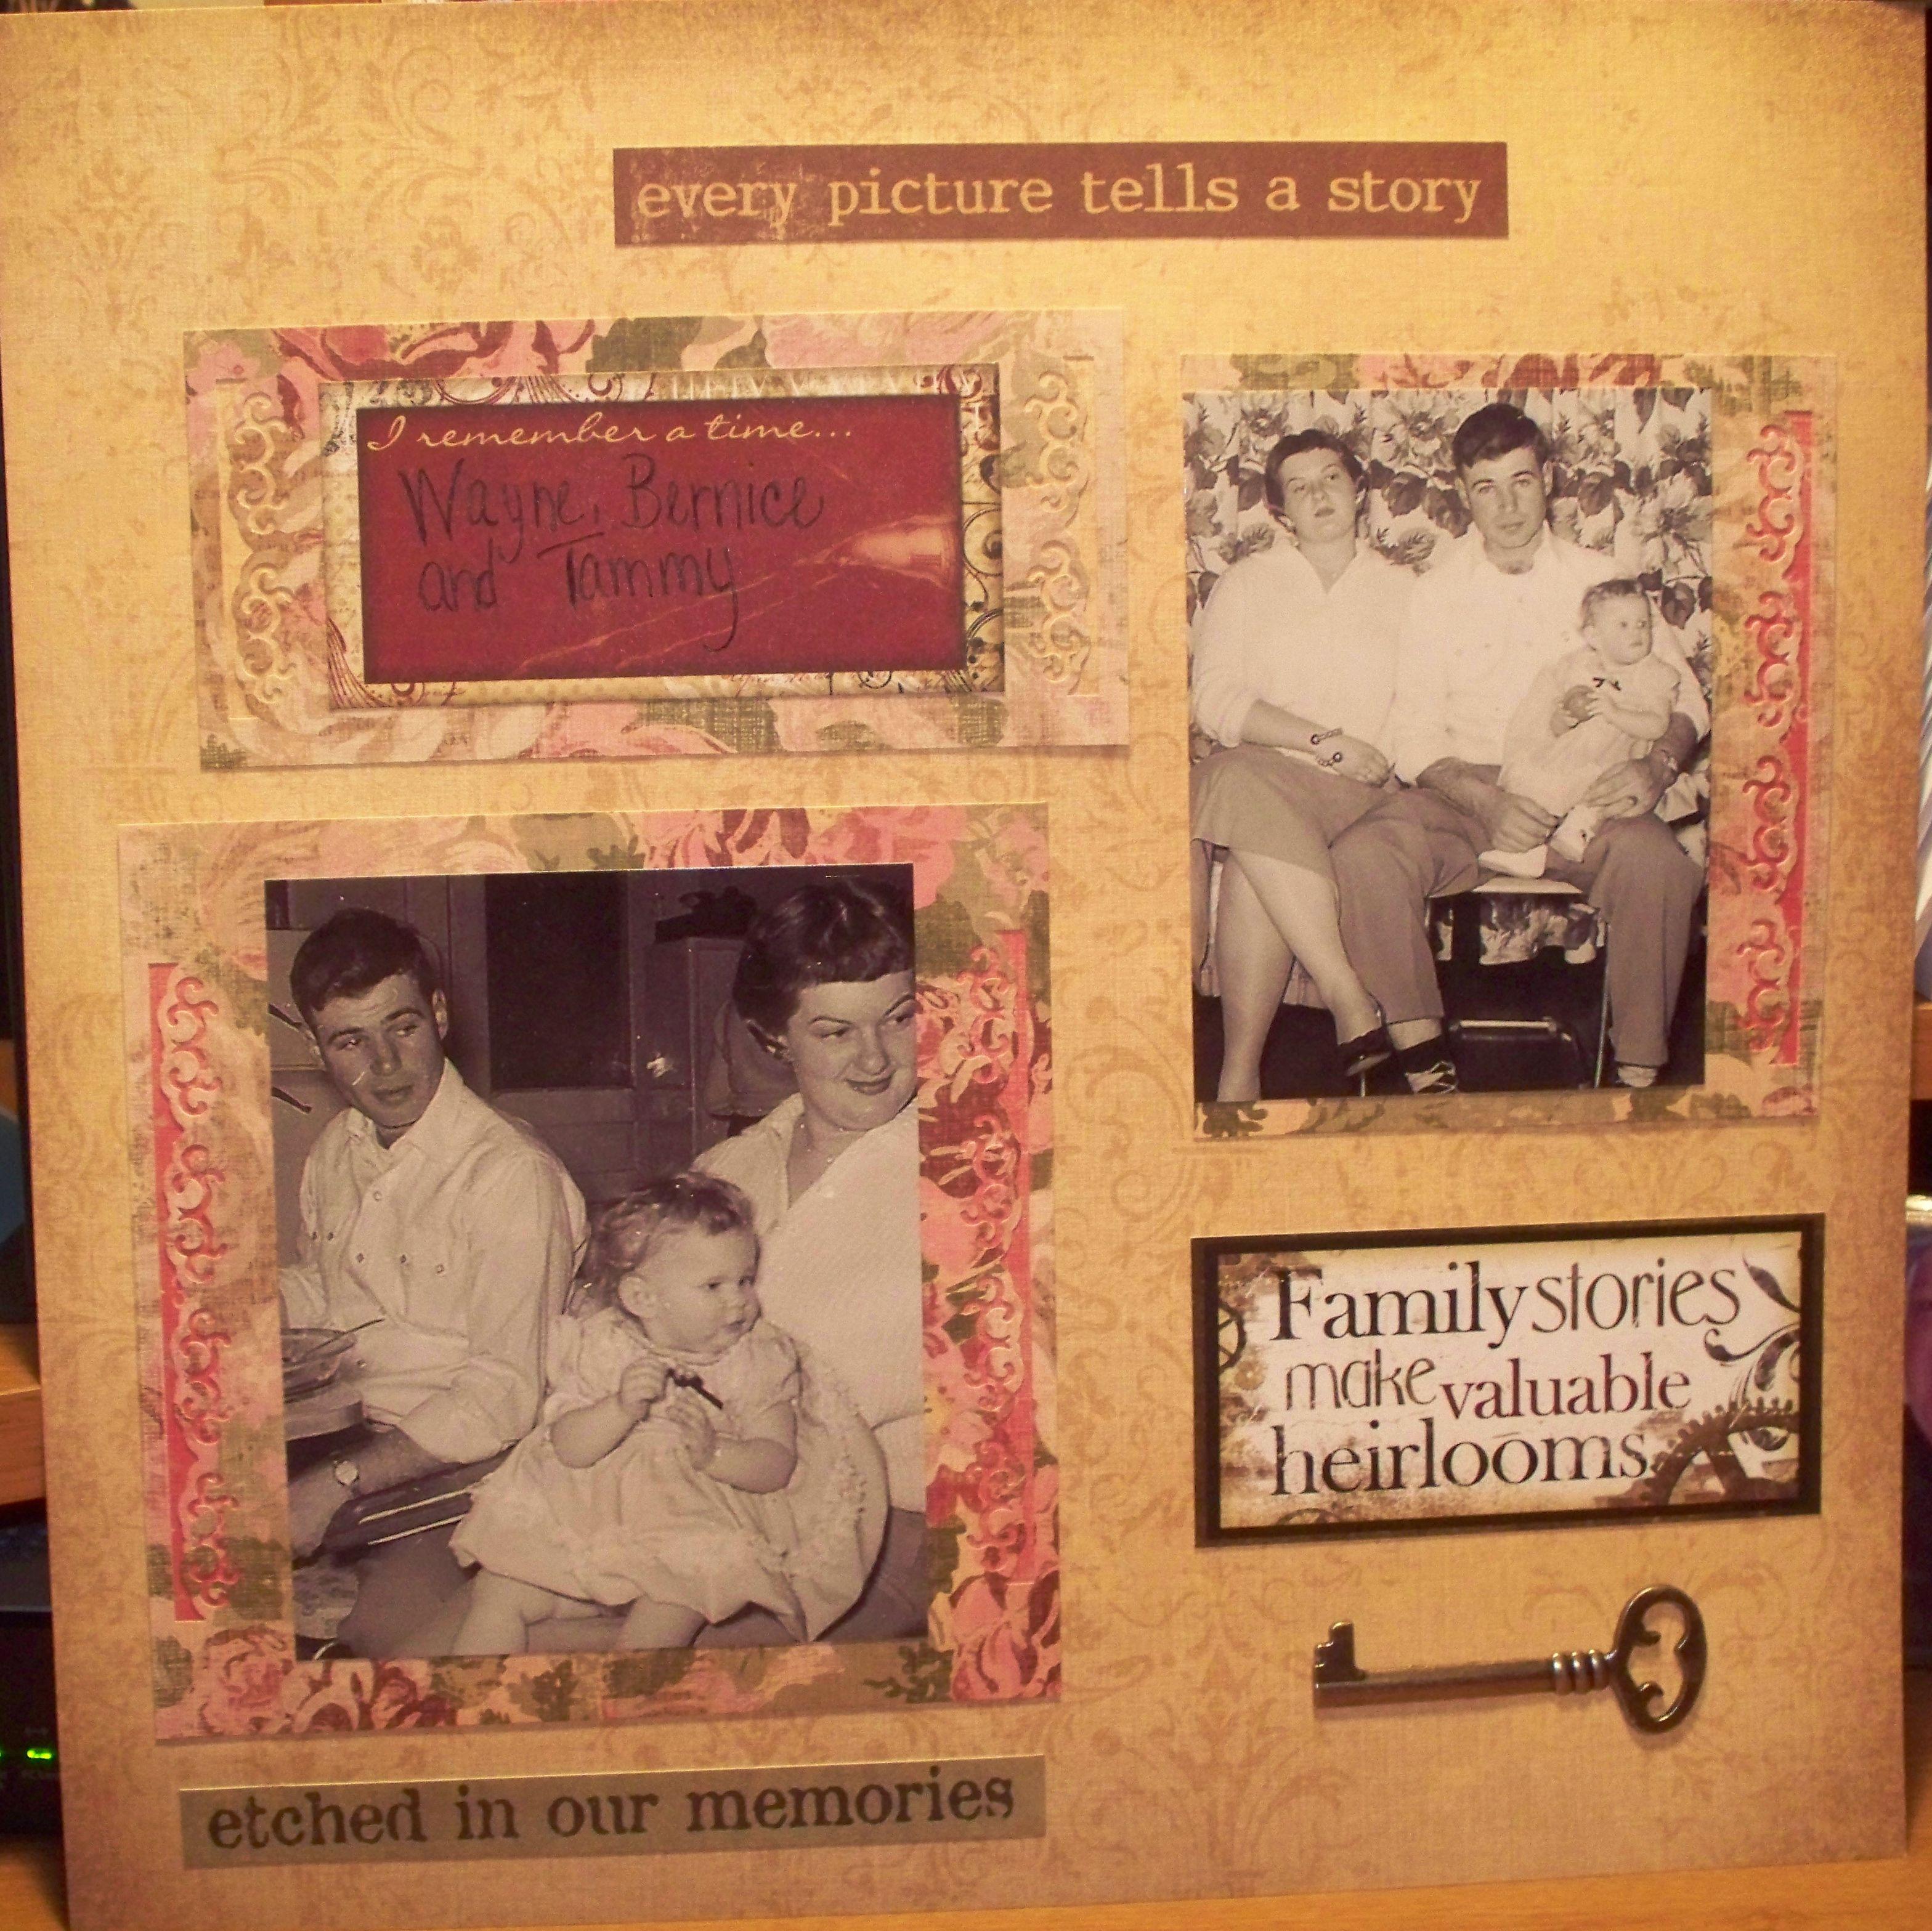 Family scrapbook ideas on pinterest - Finding Great Ideas To Start Scrapbooking Grandma Hagermans Millions Of Photos Family Scrapbook